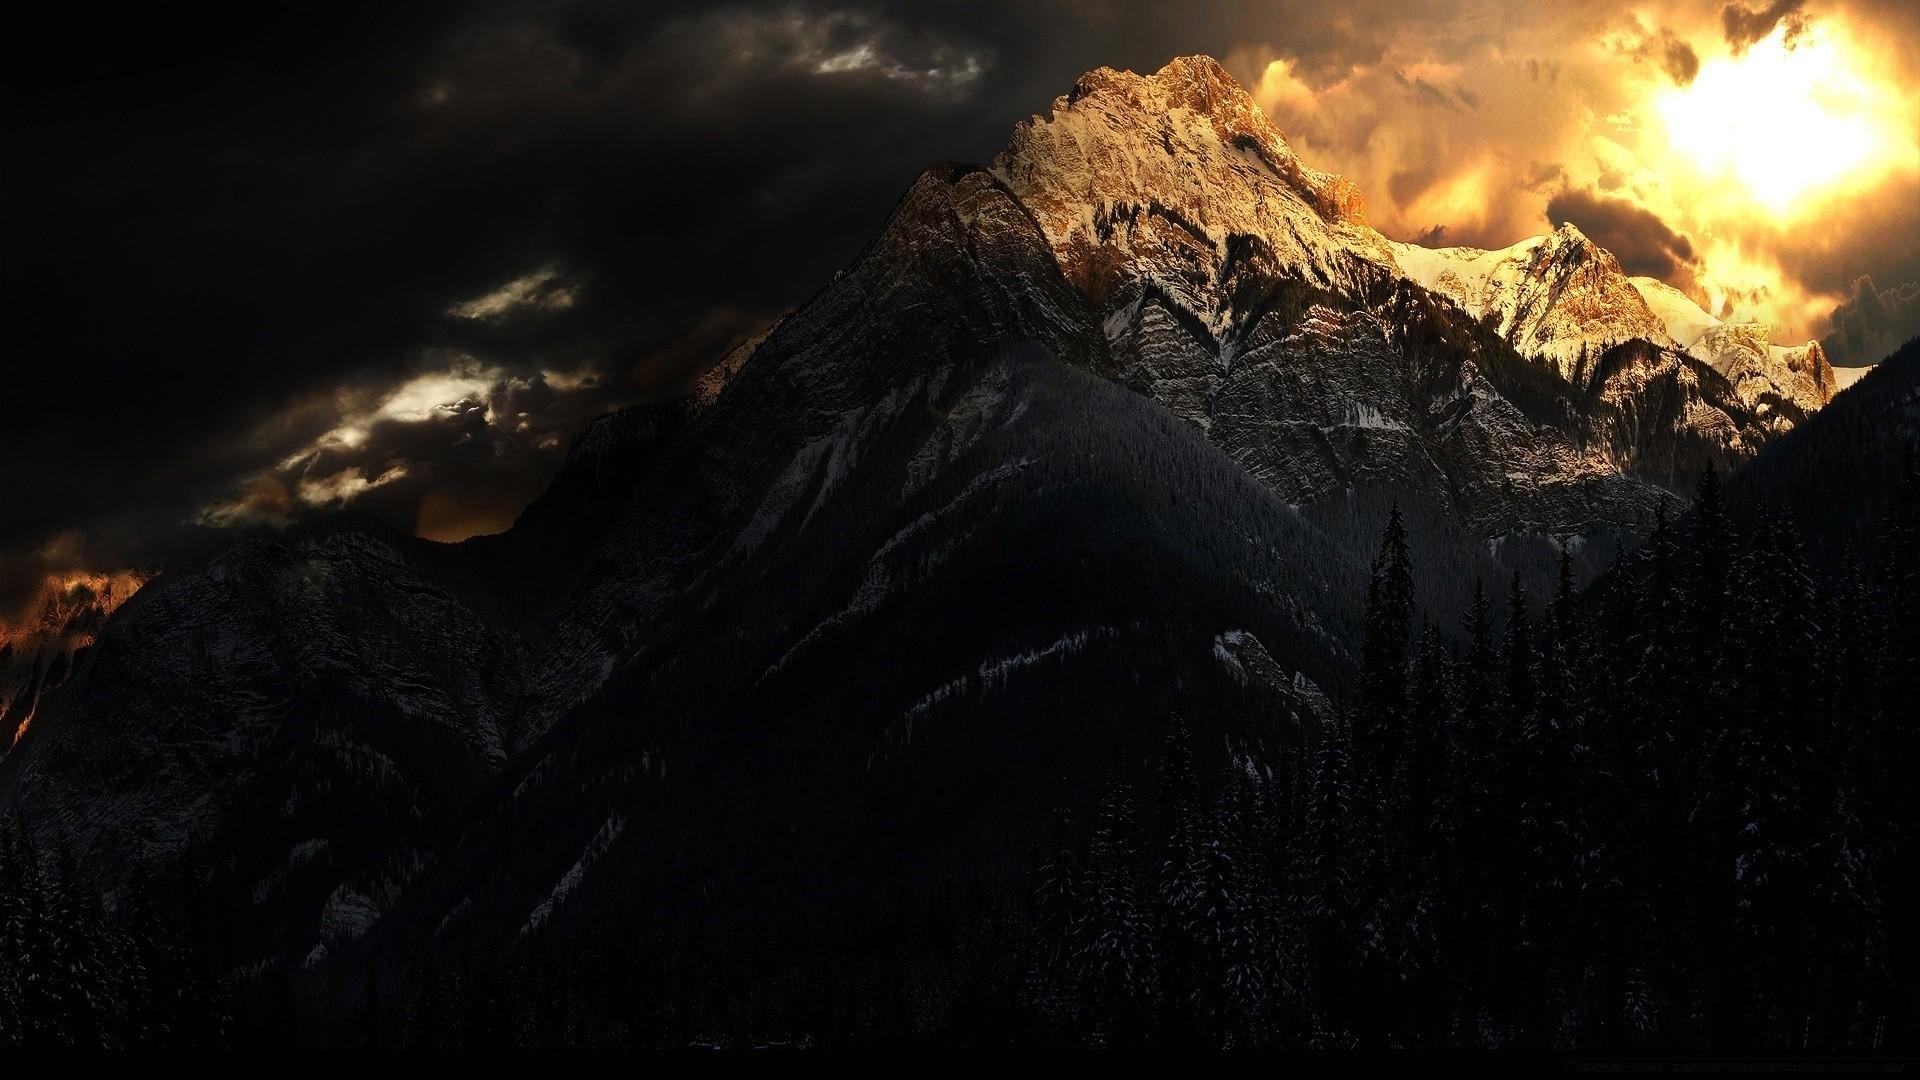 Dark Mountain HD Wallpaper